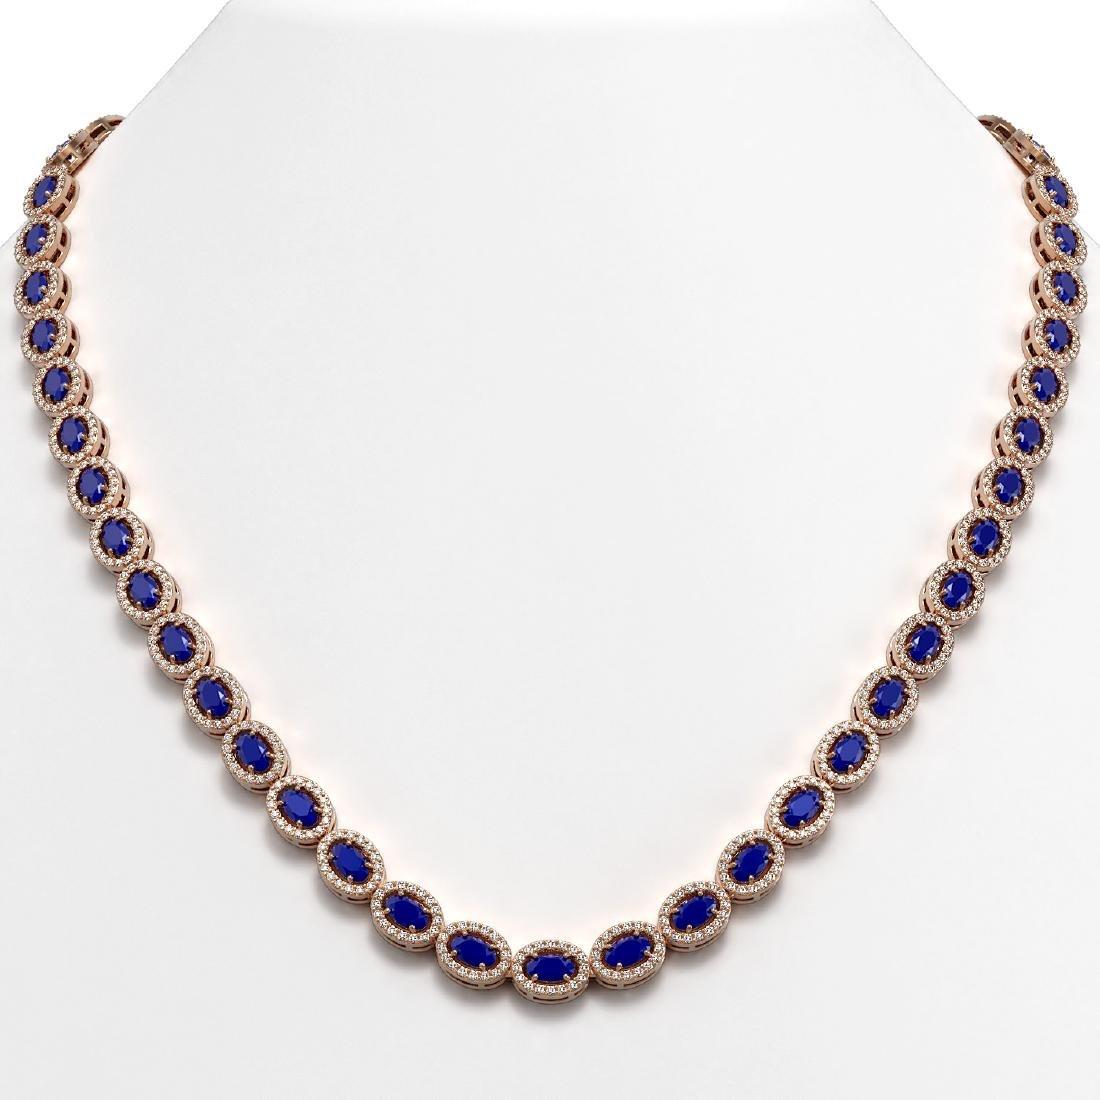 26.38 CTW Sapphire & Diamond Halo Necklace 10K Rose